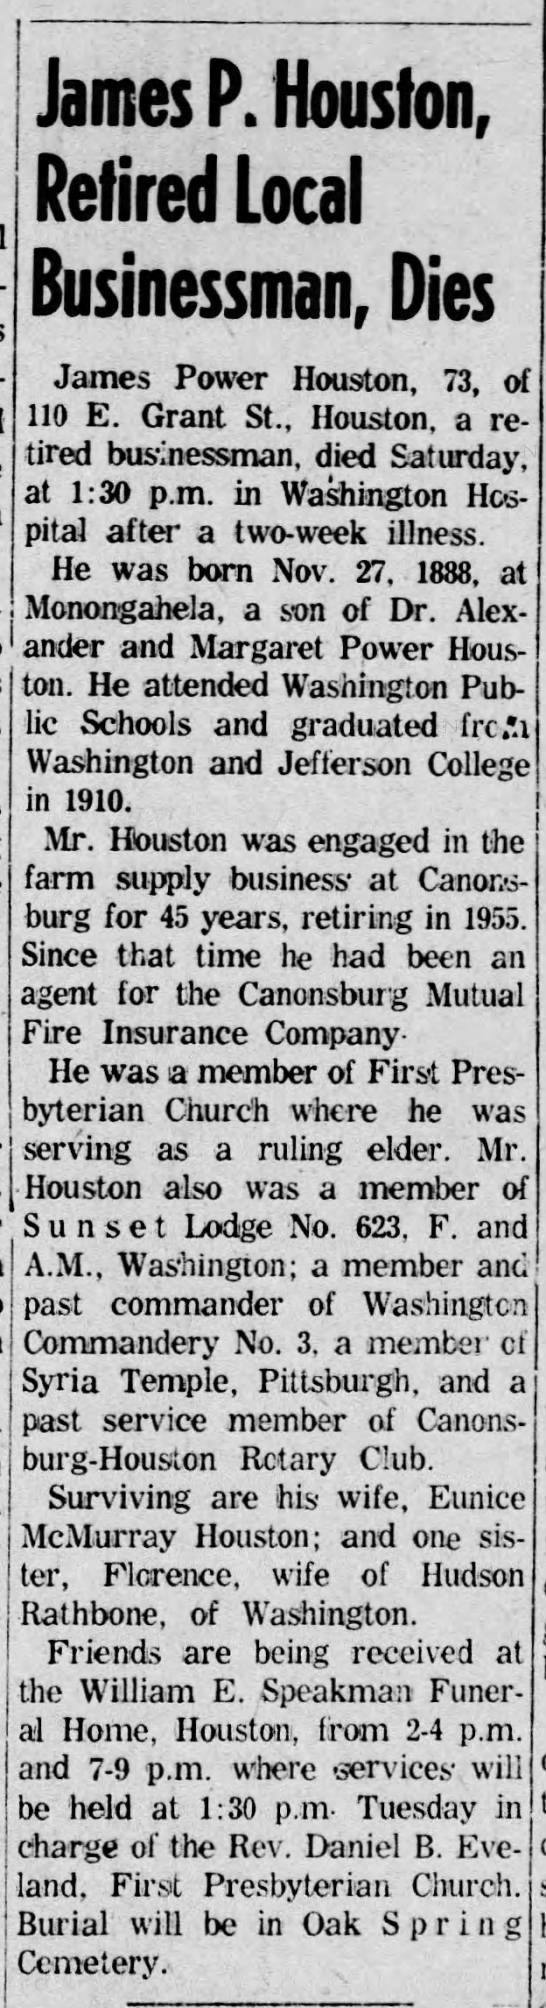 Houston James P Obit TDN Monday 5 Feb 1962 -